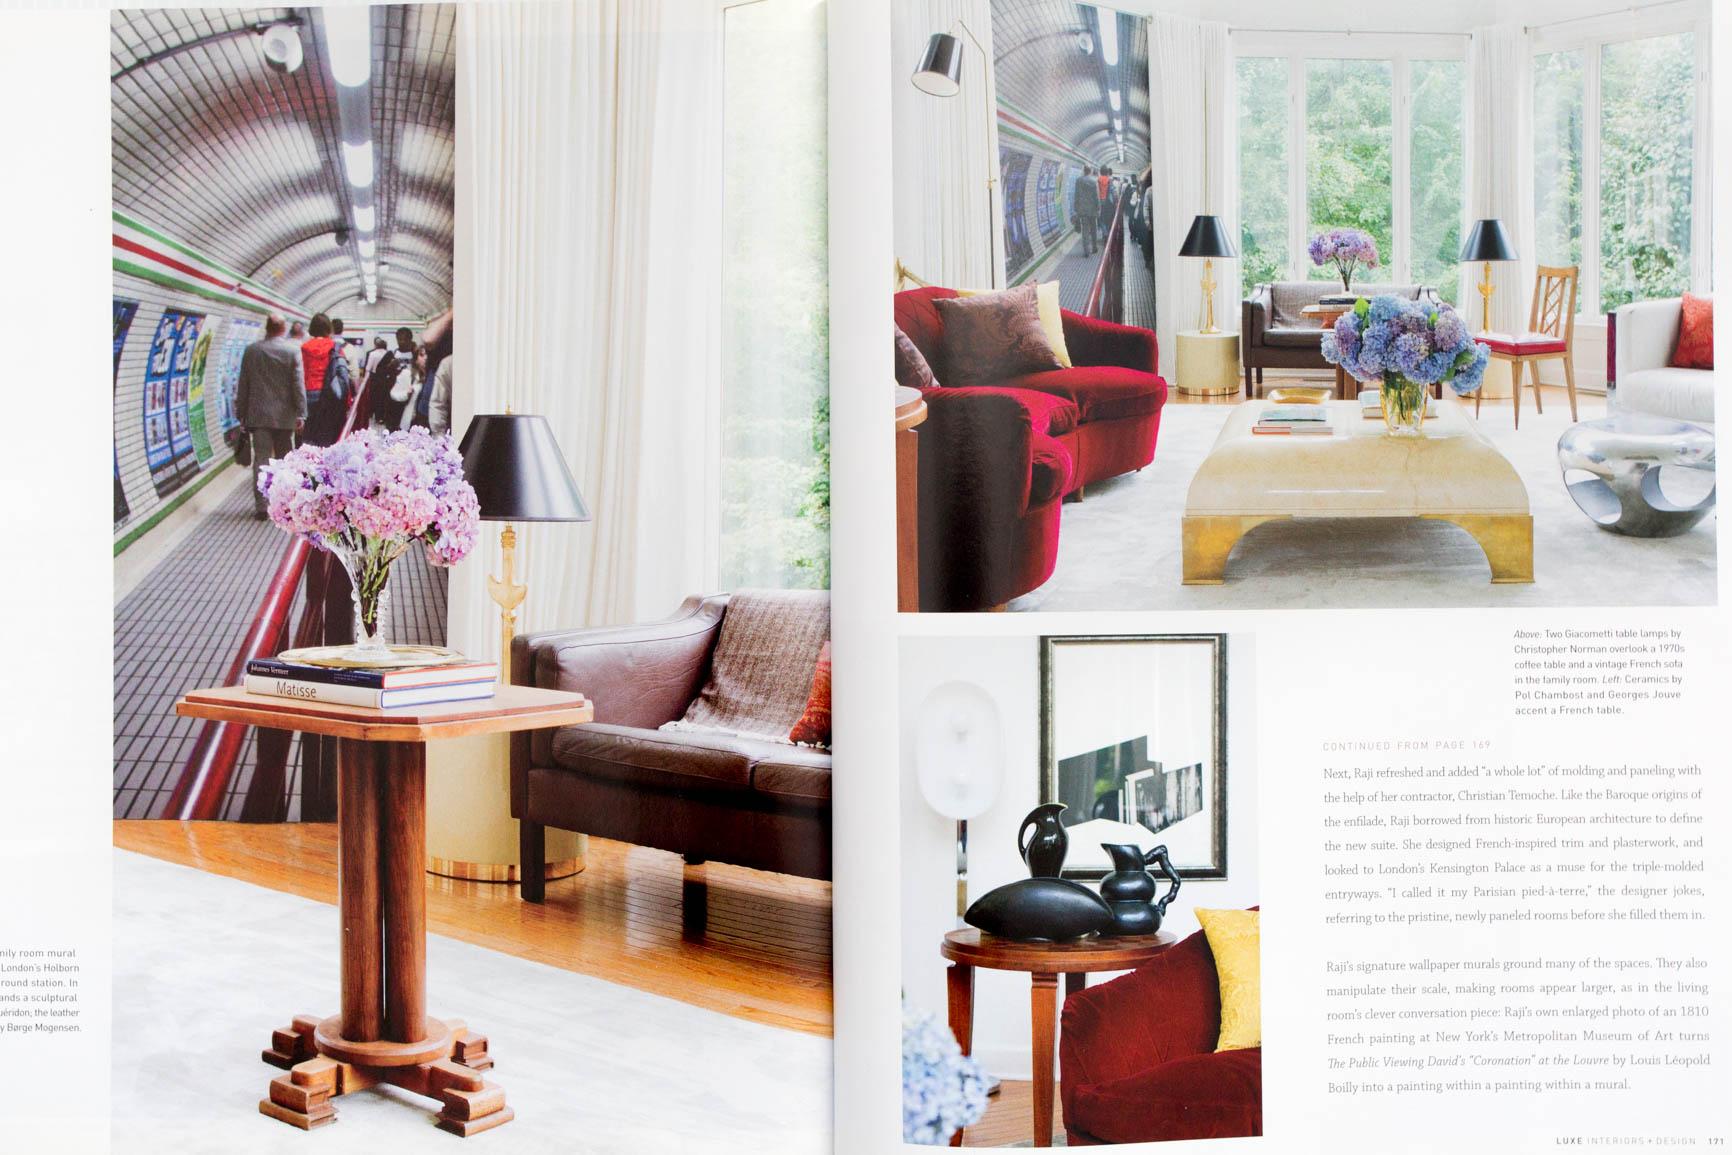 luxe-magazine-family-room-dc-interior-design.jpg